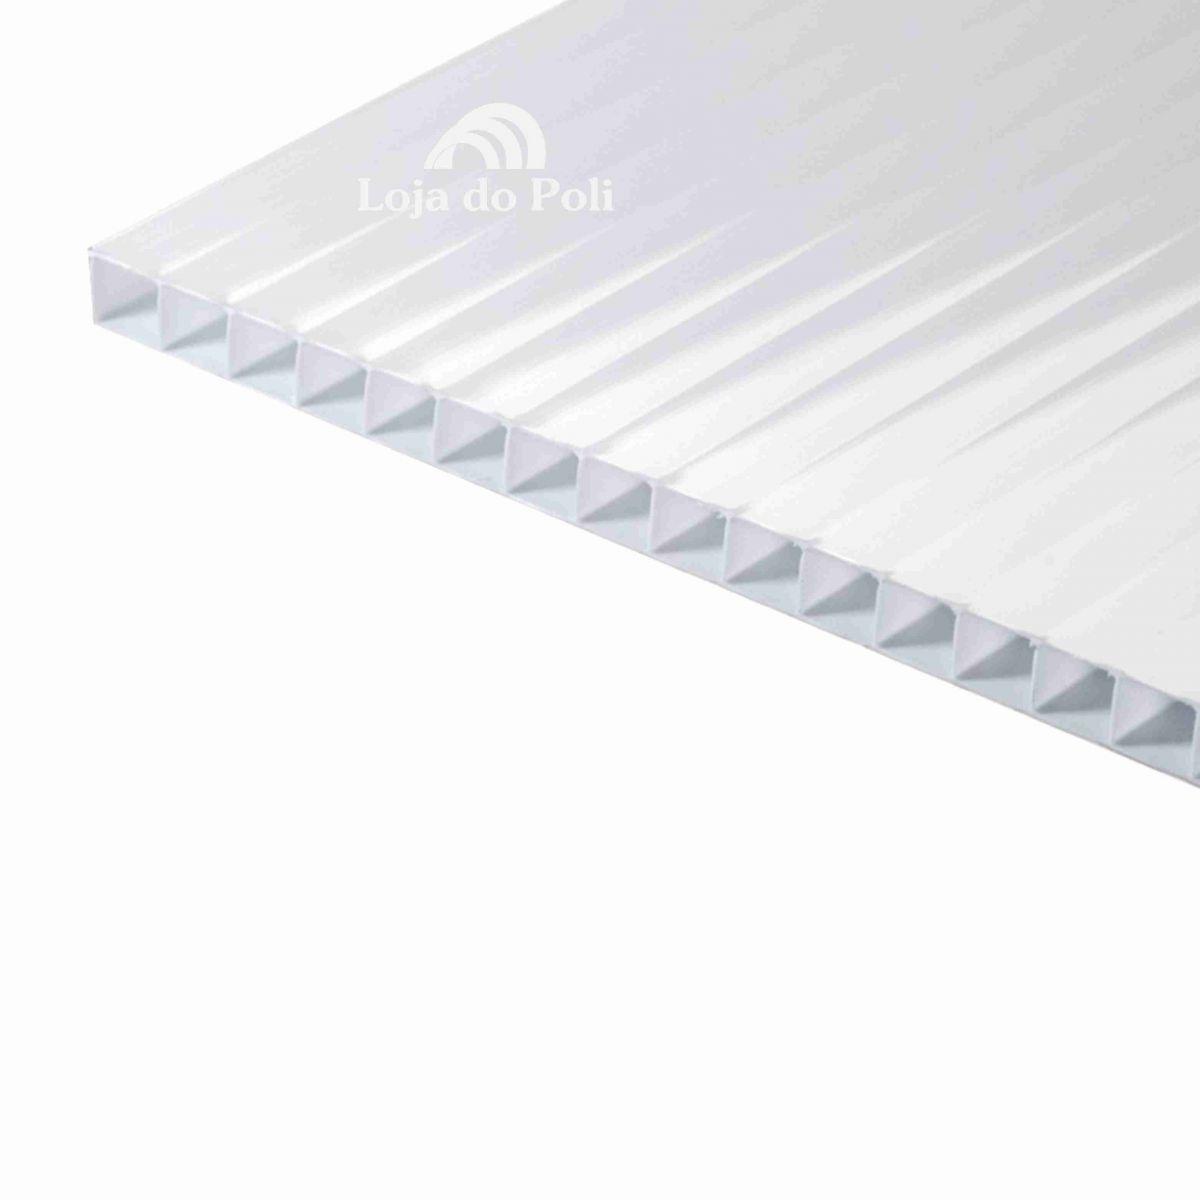 Chapa Policarbonato Alveolar Pérola Solar Reflective 6mm 1,0x6,0m